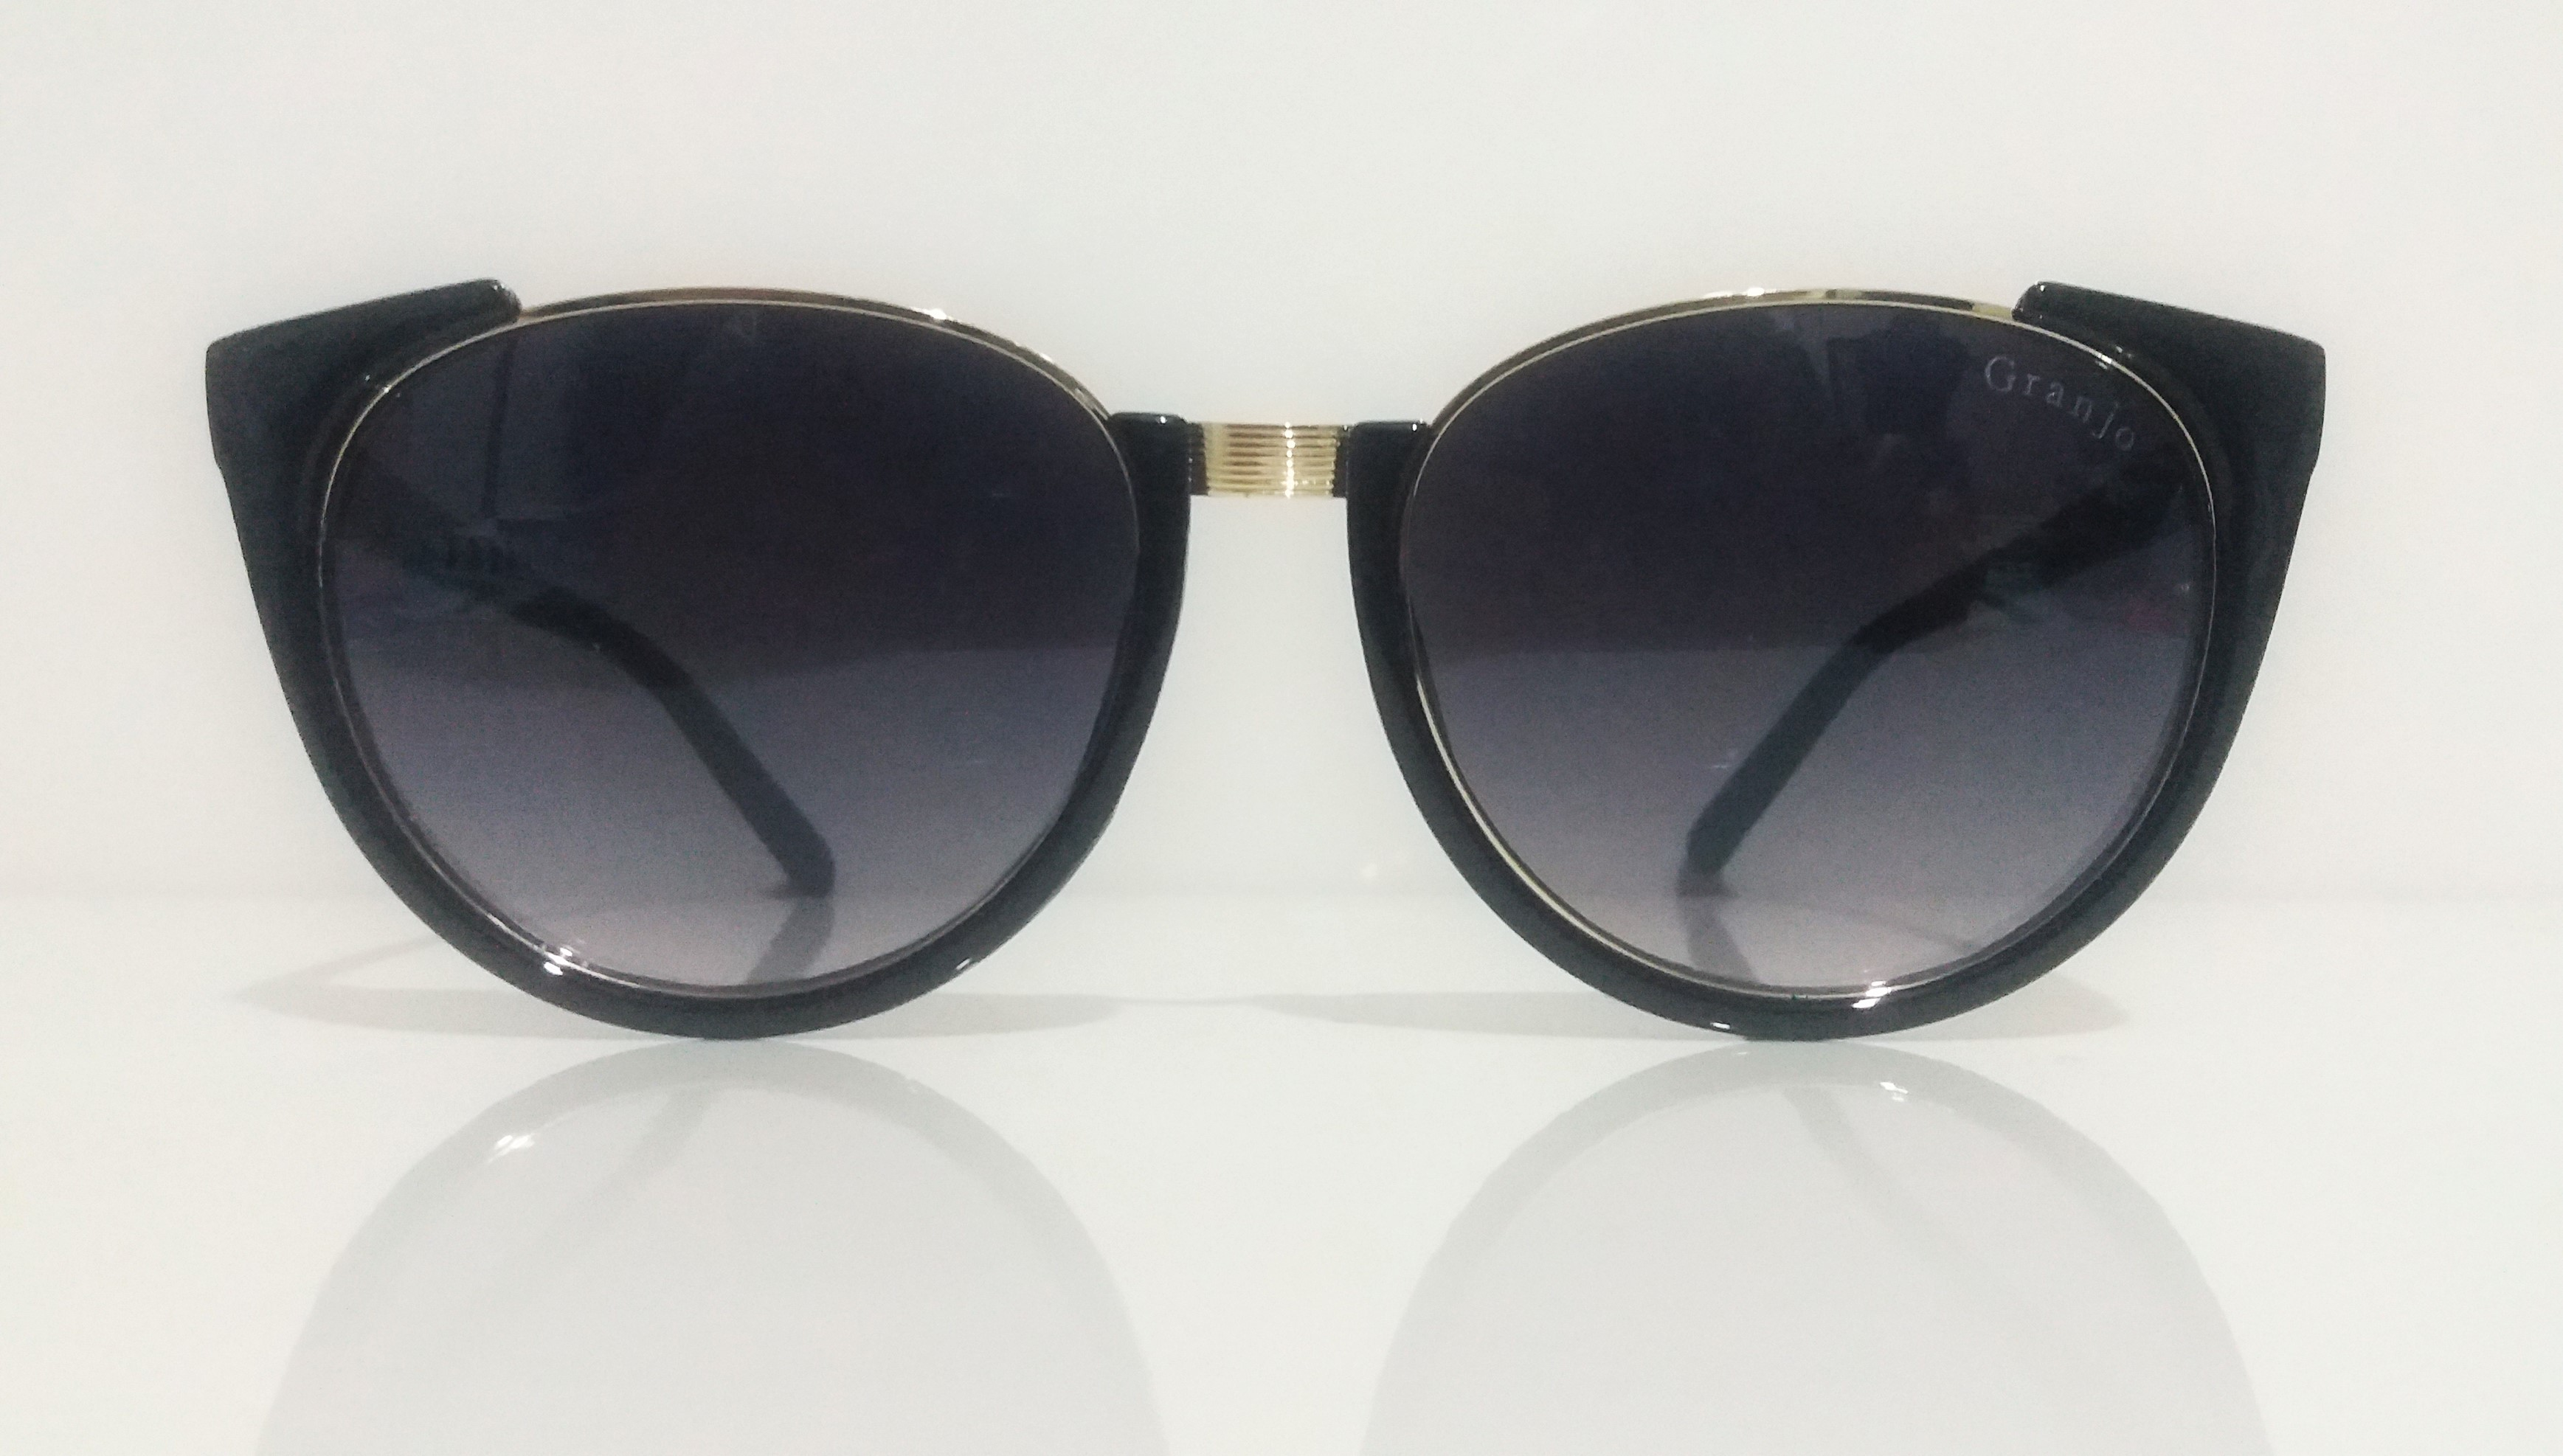 عینک آفتابی زنانه گرانجو مدل 8296